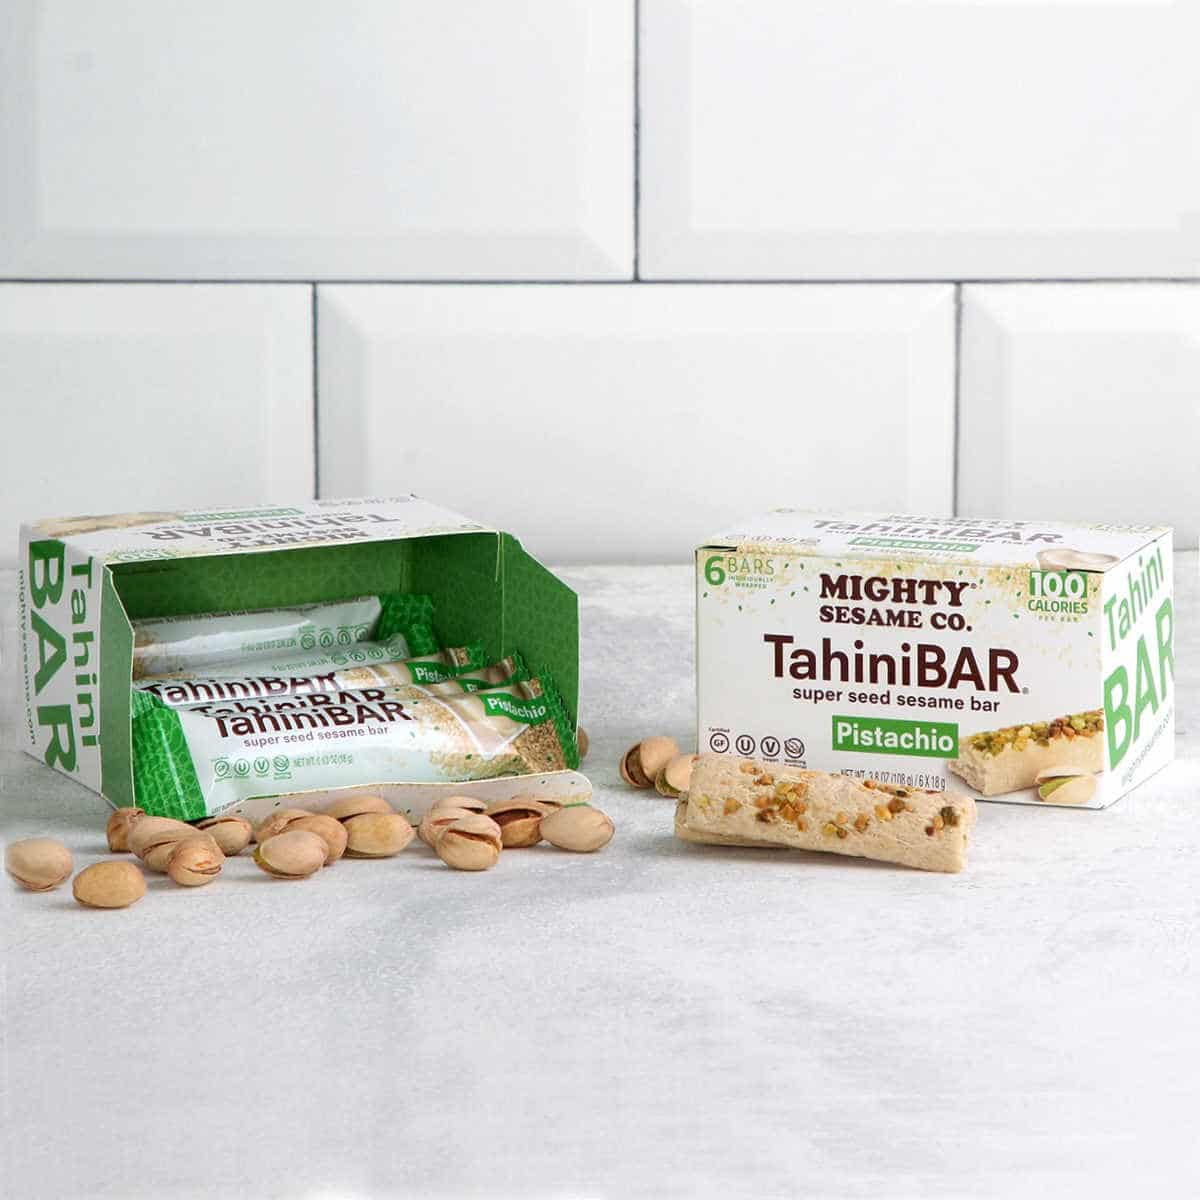 tahini bar box sitting next to tahini bars and pistachios